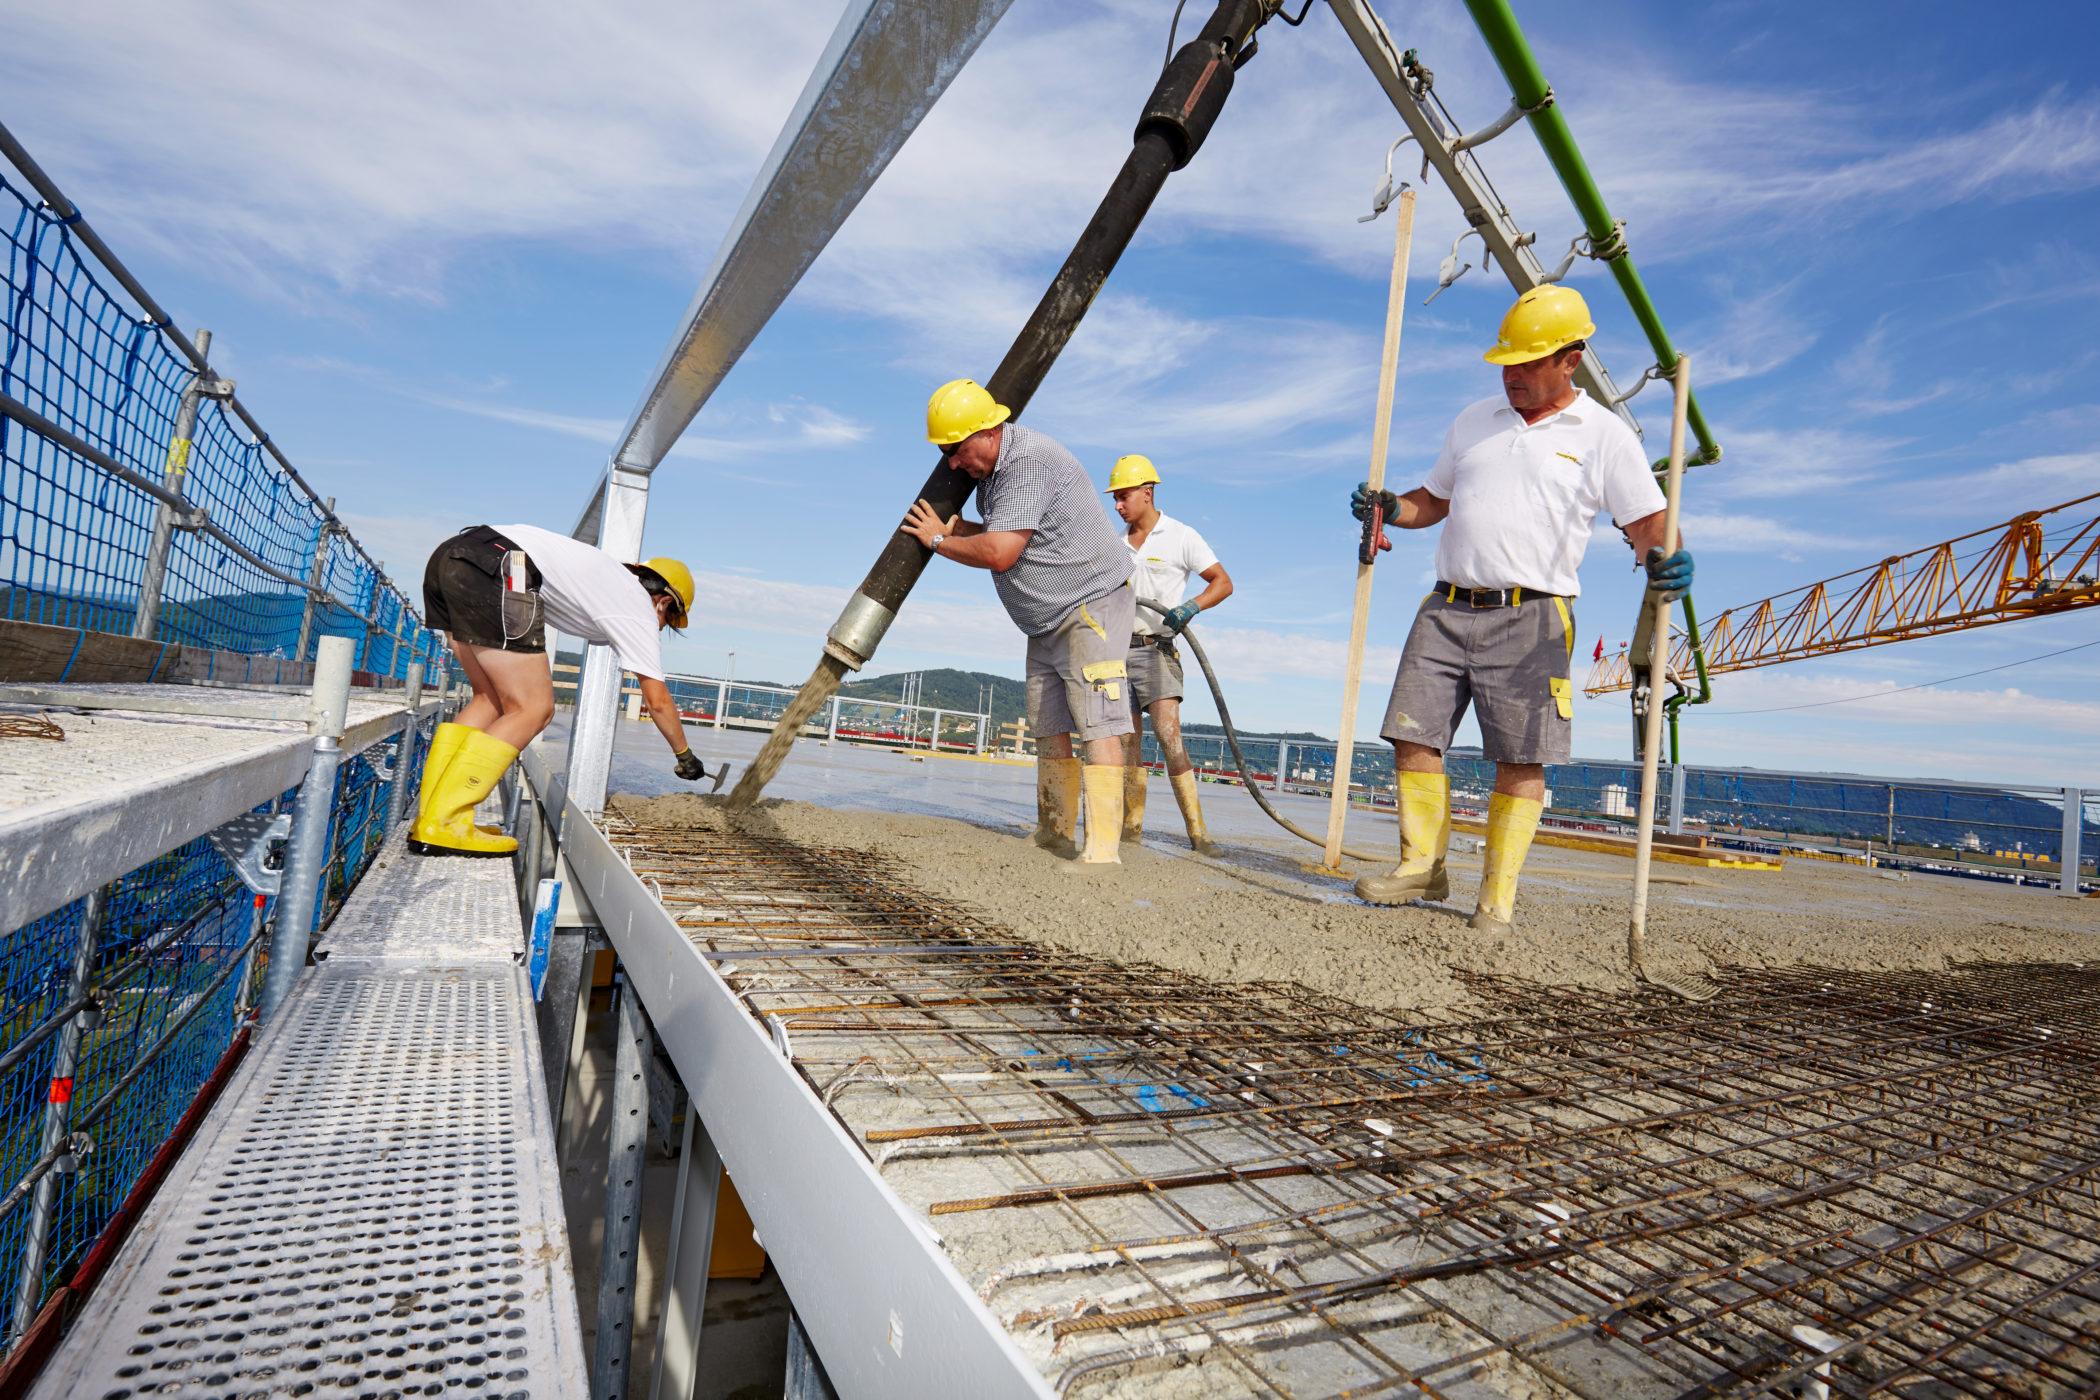 Pongratz Bau, Bauarbeiter, betonieren,